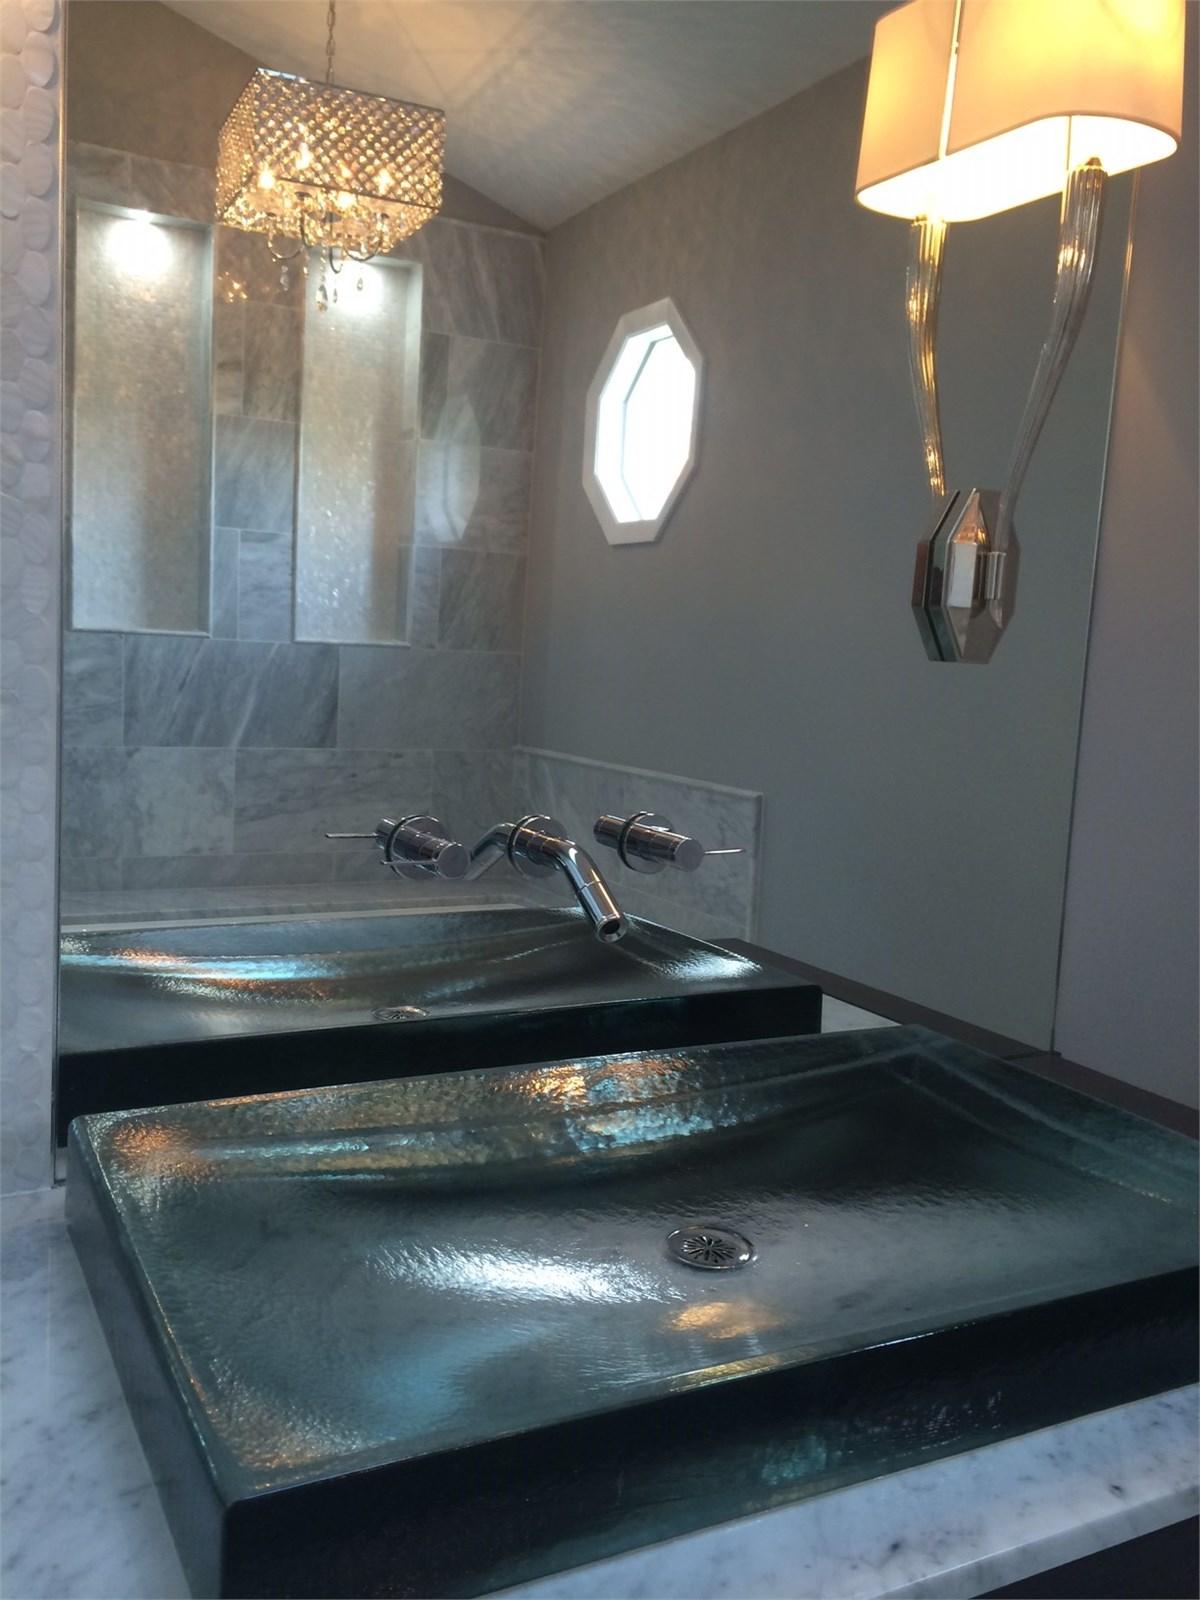 Bathroom Vanity Renovation Ideas: Bathroom Vanity Replacement